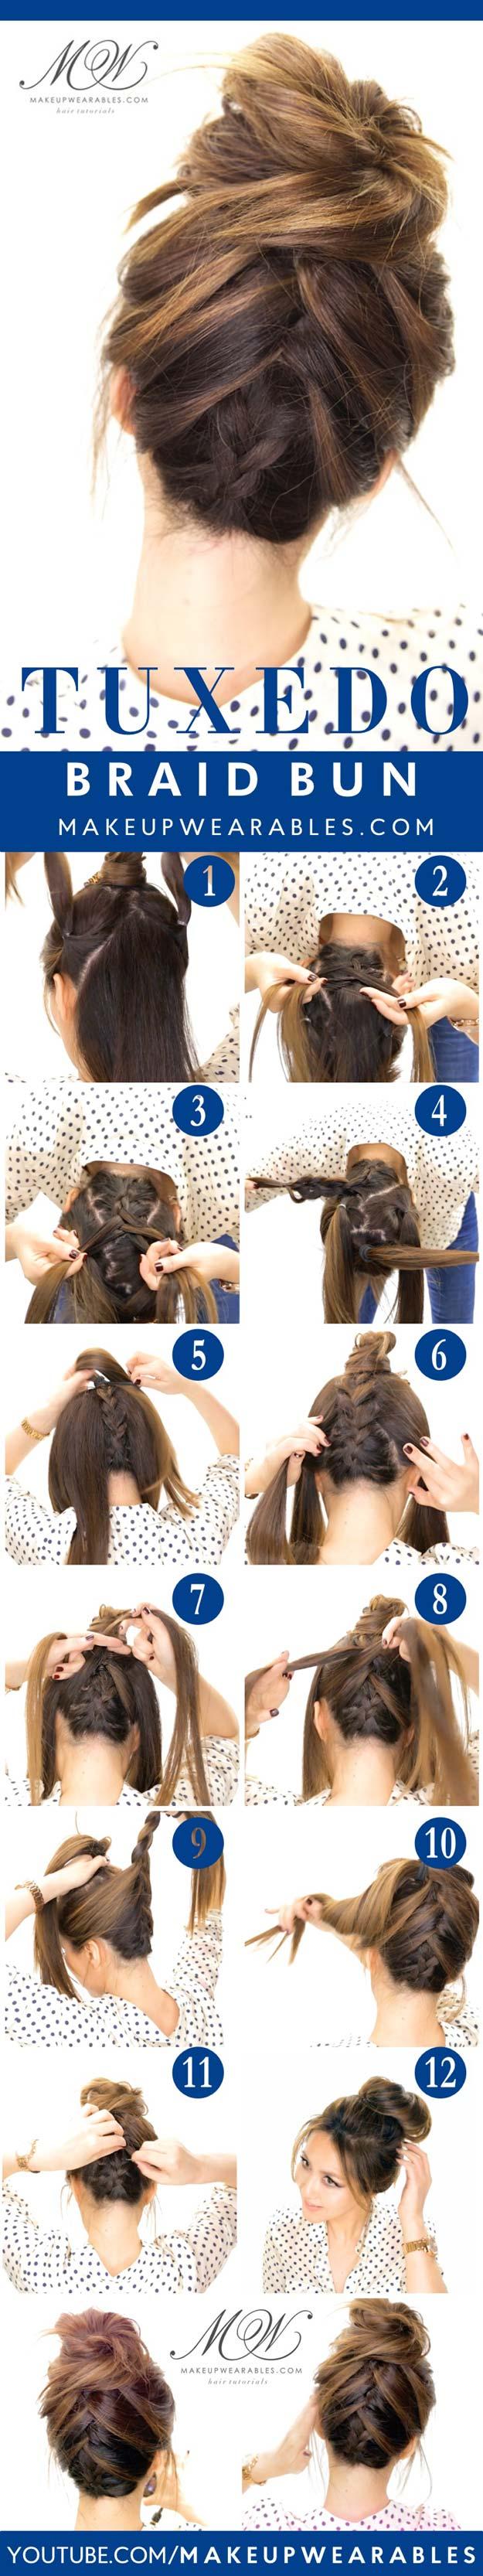 Best Hair Braiding Tutorials - Tuxedo Braid Messy Bun - Easy Step by Step Tutorials for Braids - How To Braid Fishtail, French Braids, Flower Crown, Side Braids, Cornrows, Updos - Cool Braided Hairstyles for Girls, Teens and Women - School, Day and Evening, Boho, Casual and Formal Looks #hairstyles #braiding #braidingtutorials #diyhair